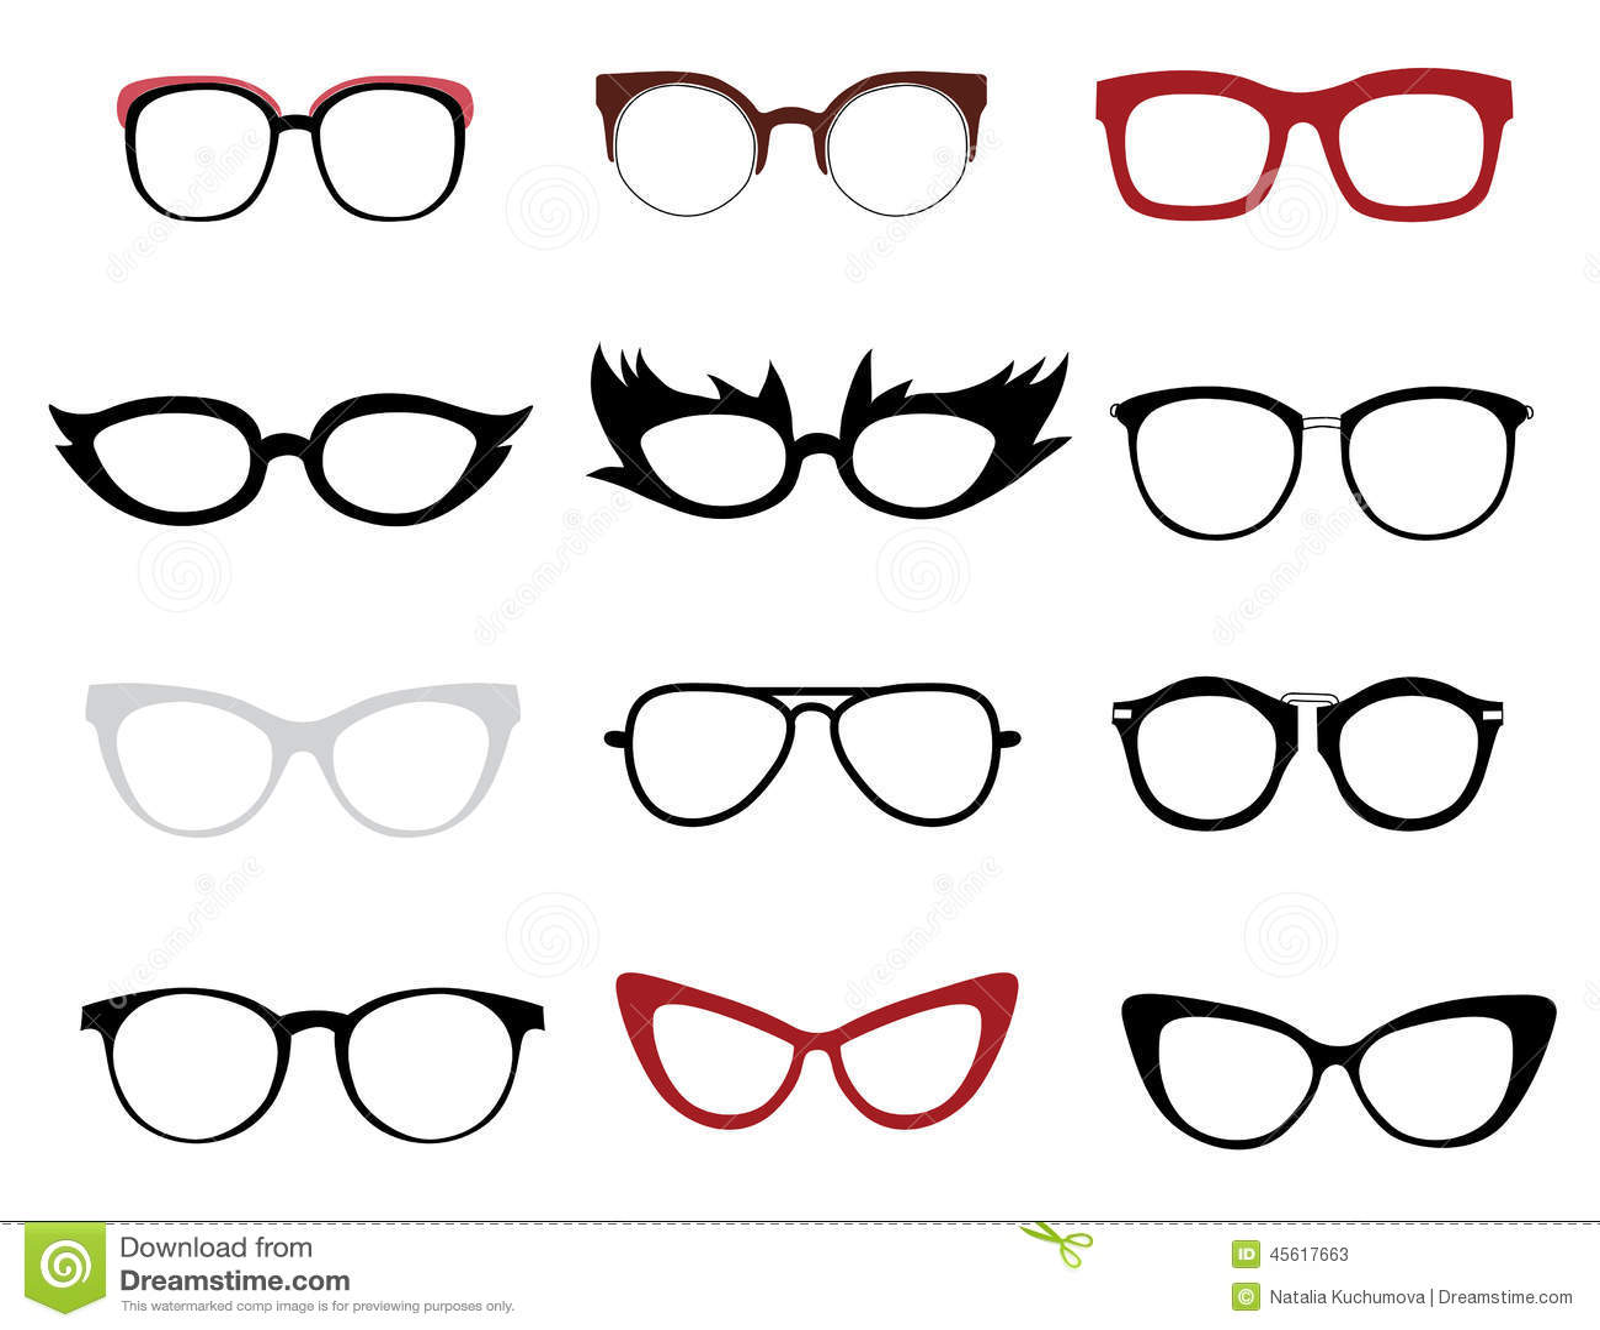 Stylish Glasses Stock Vector - Image: 45617663